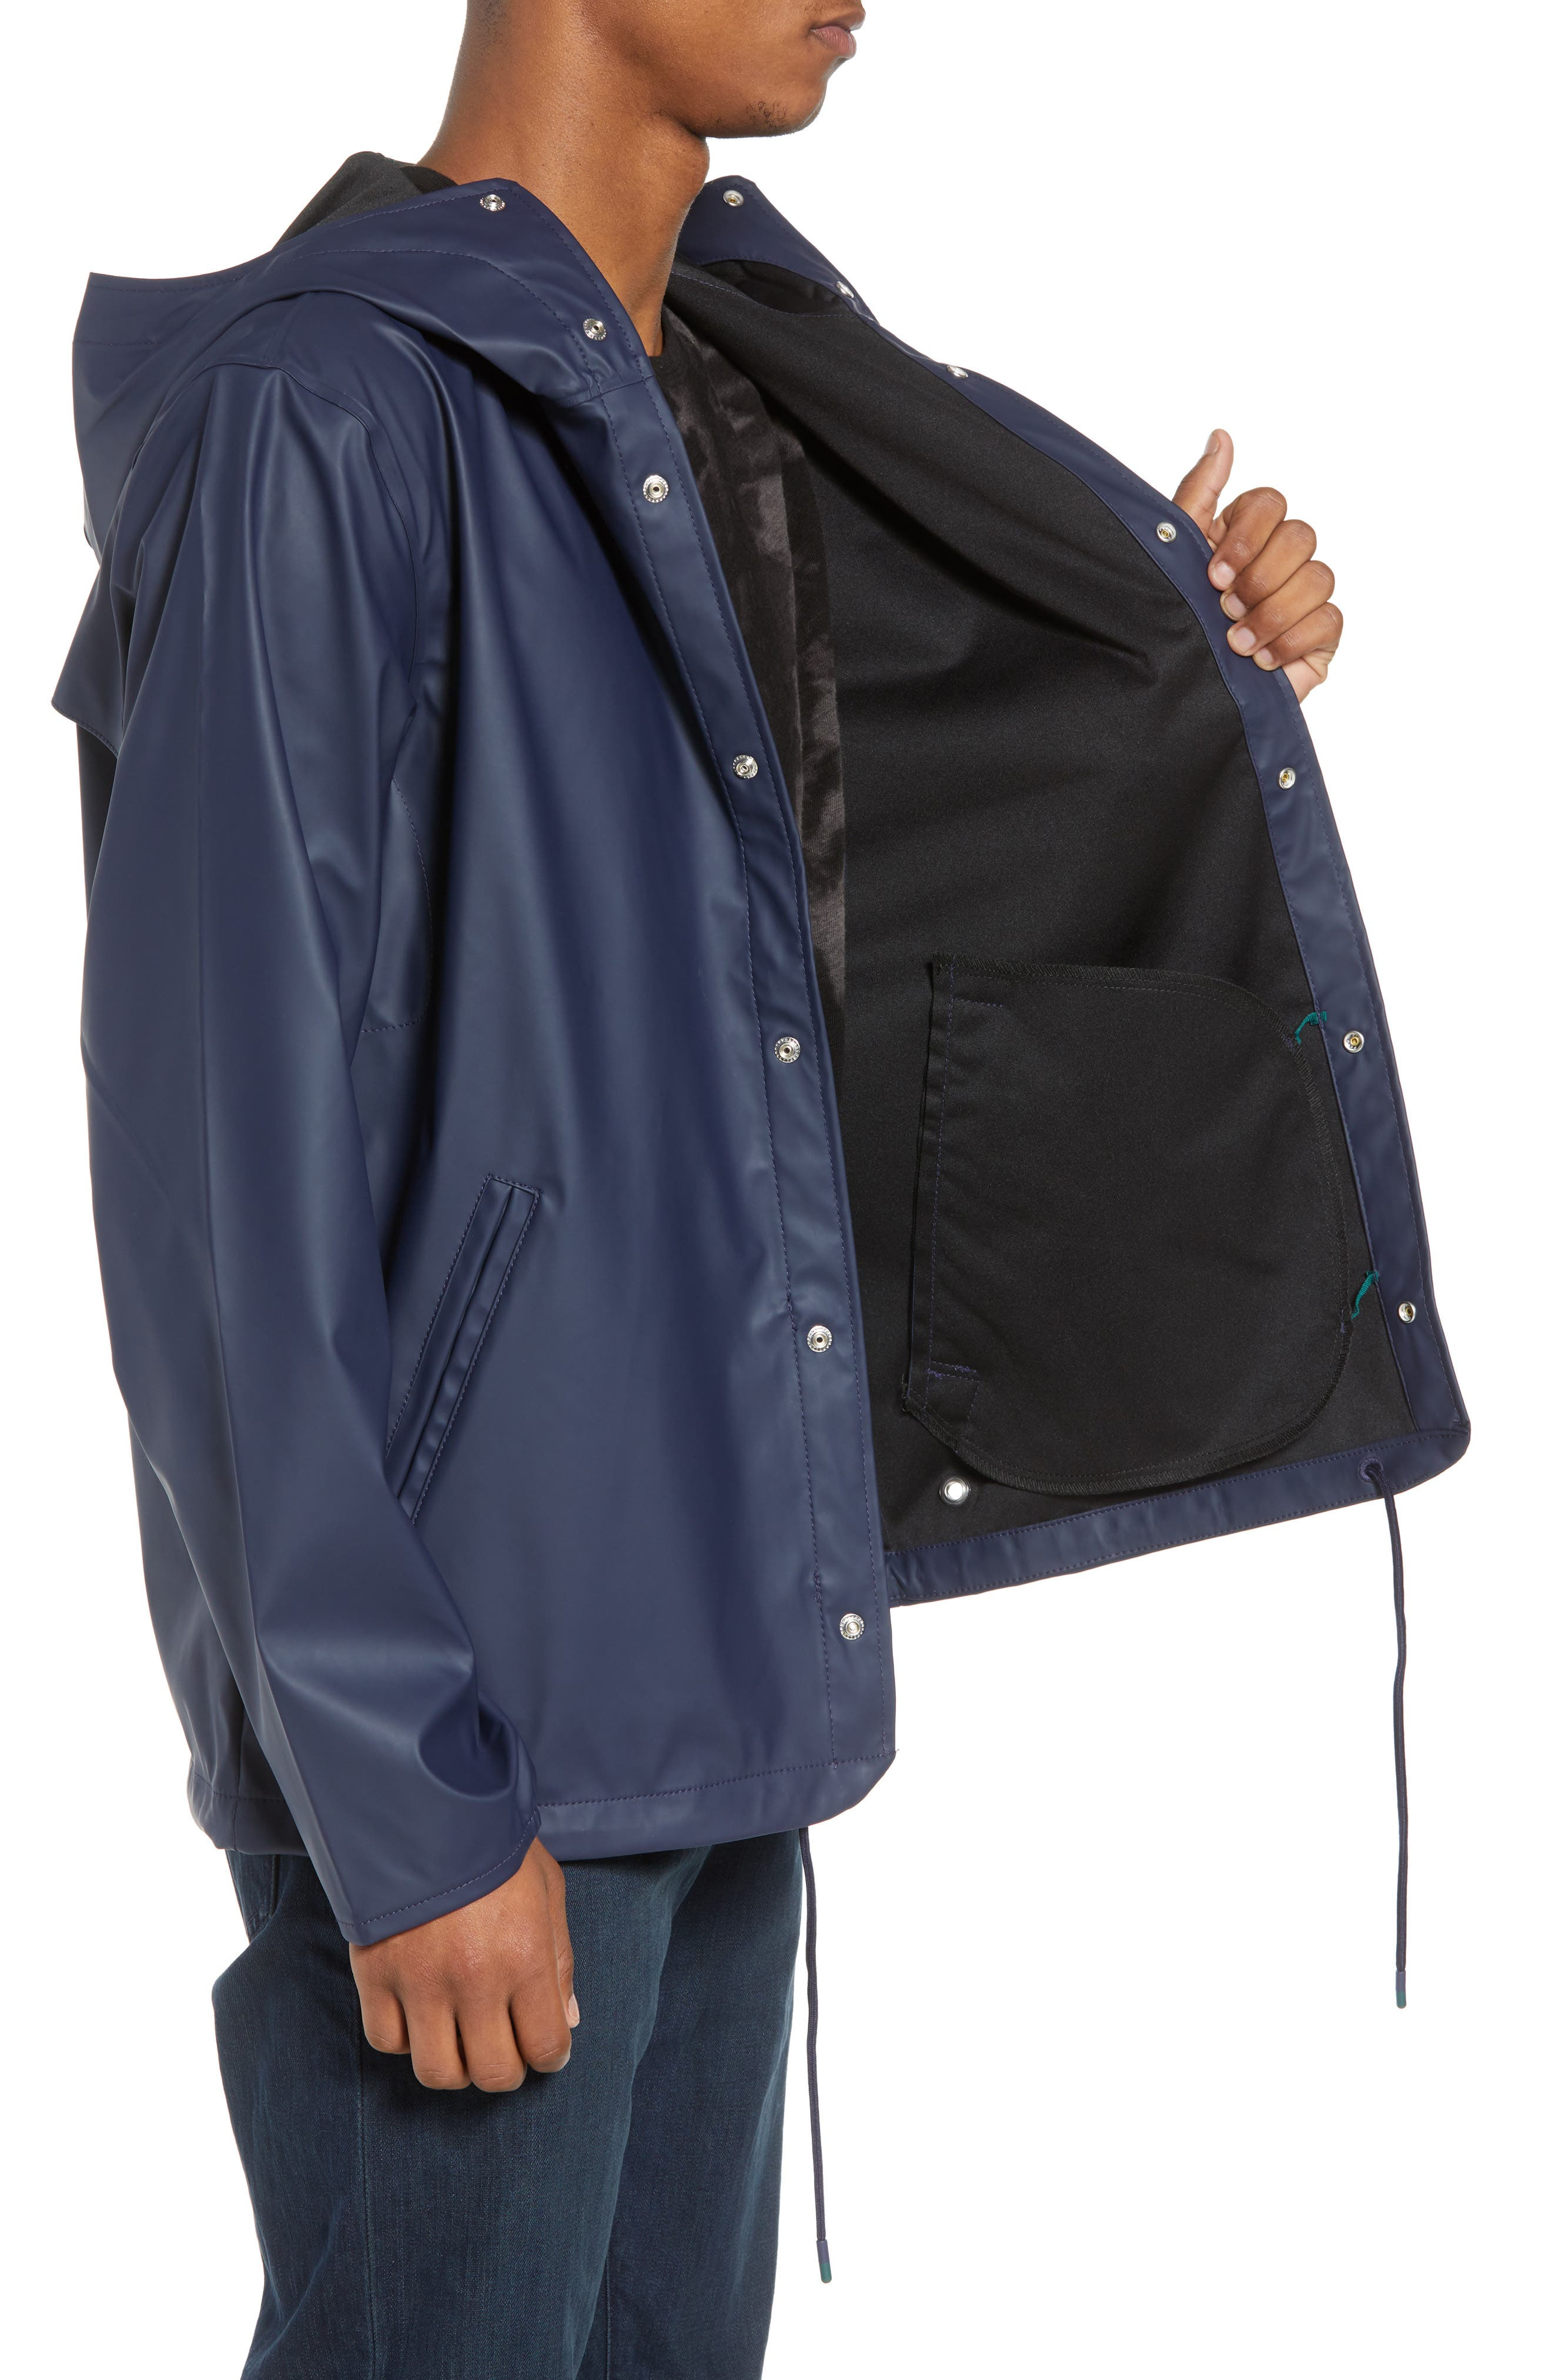 Forecast Hooded Coaches Jacket,                             Alternate thumbnail 3, color,                             Peacoat/ Peacoat